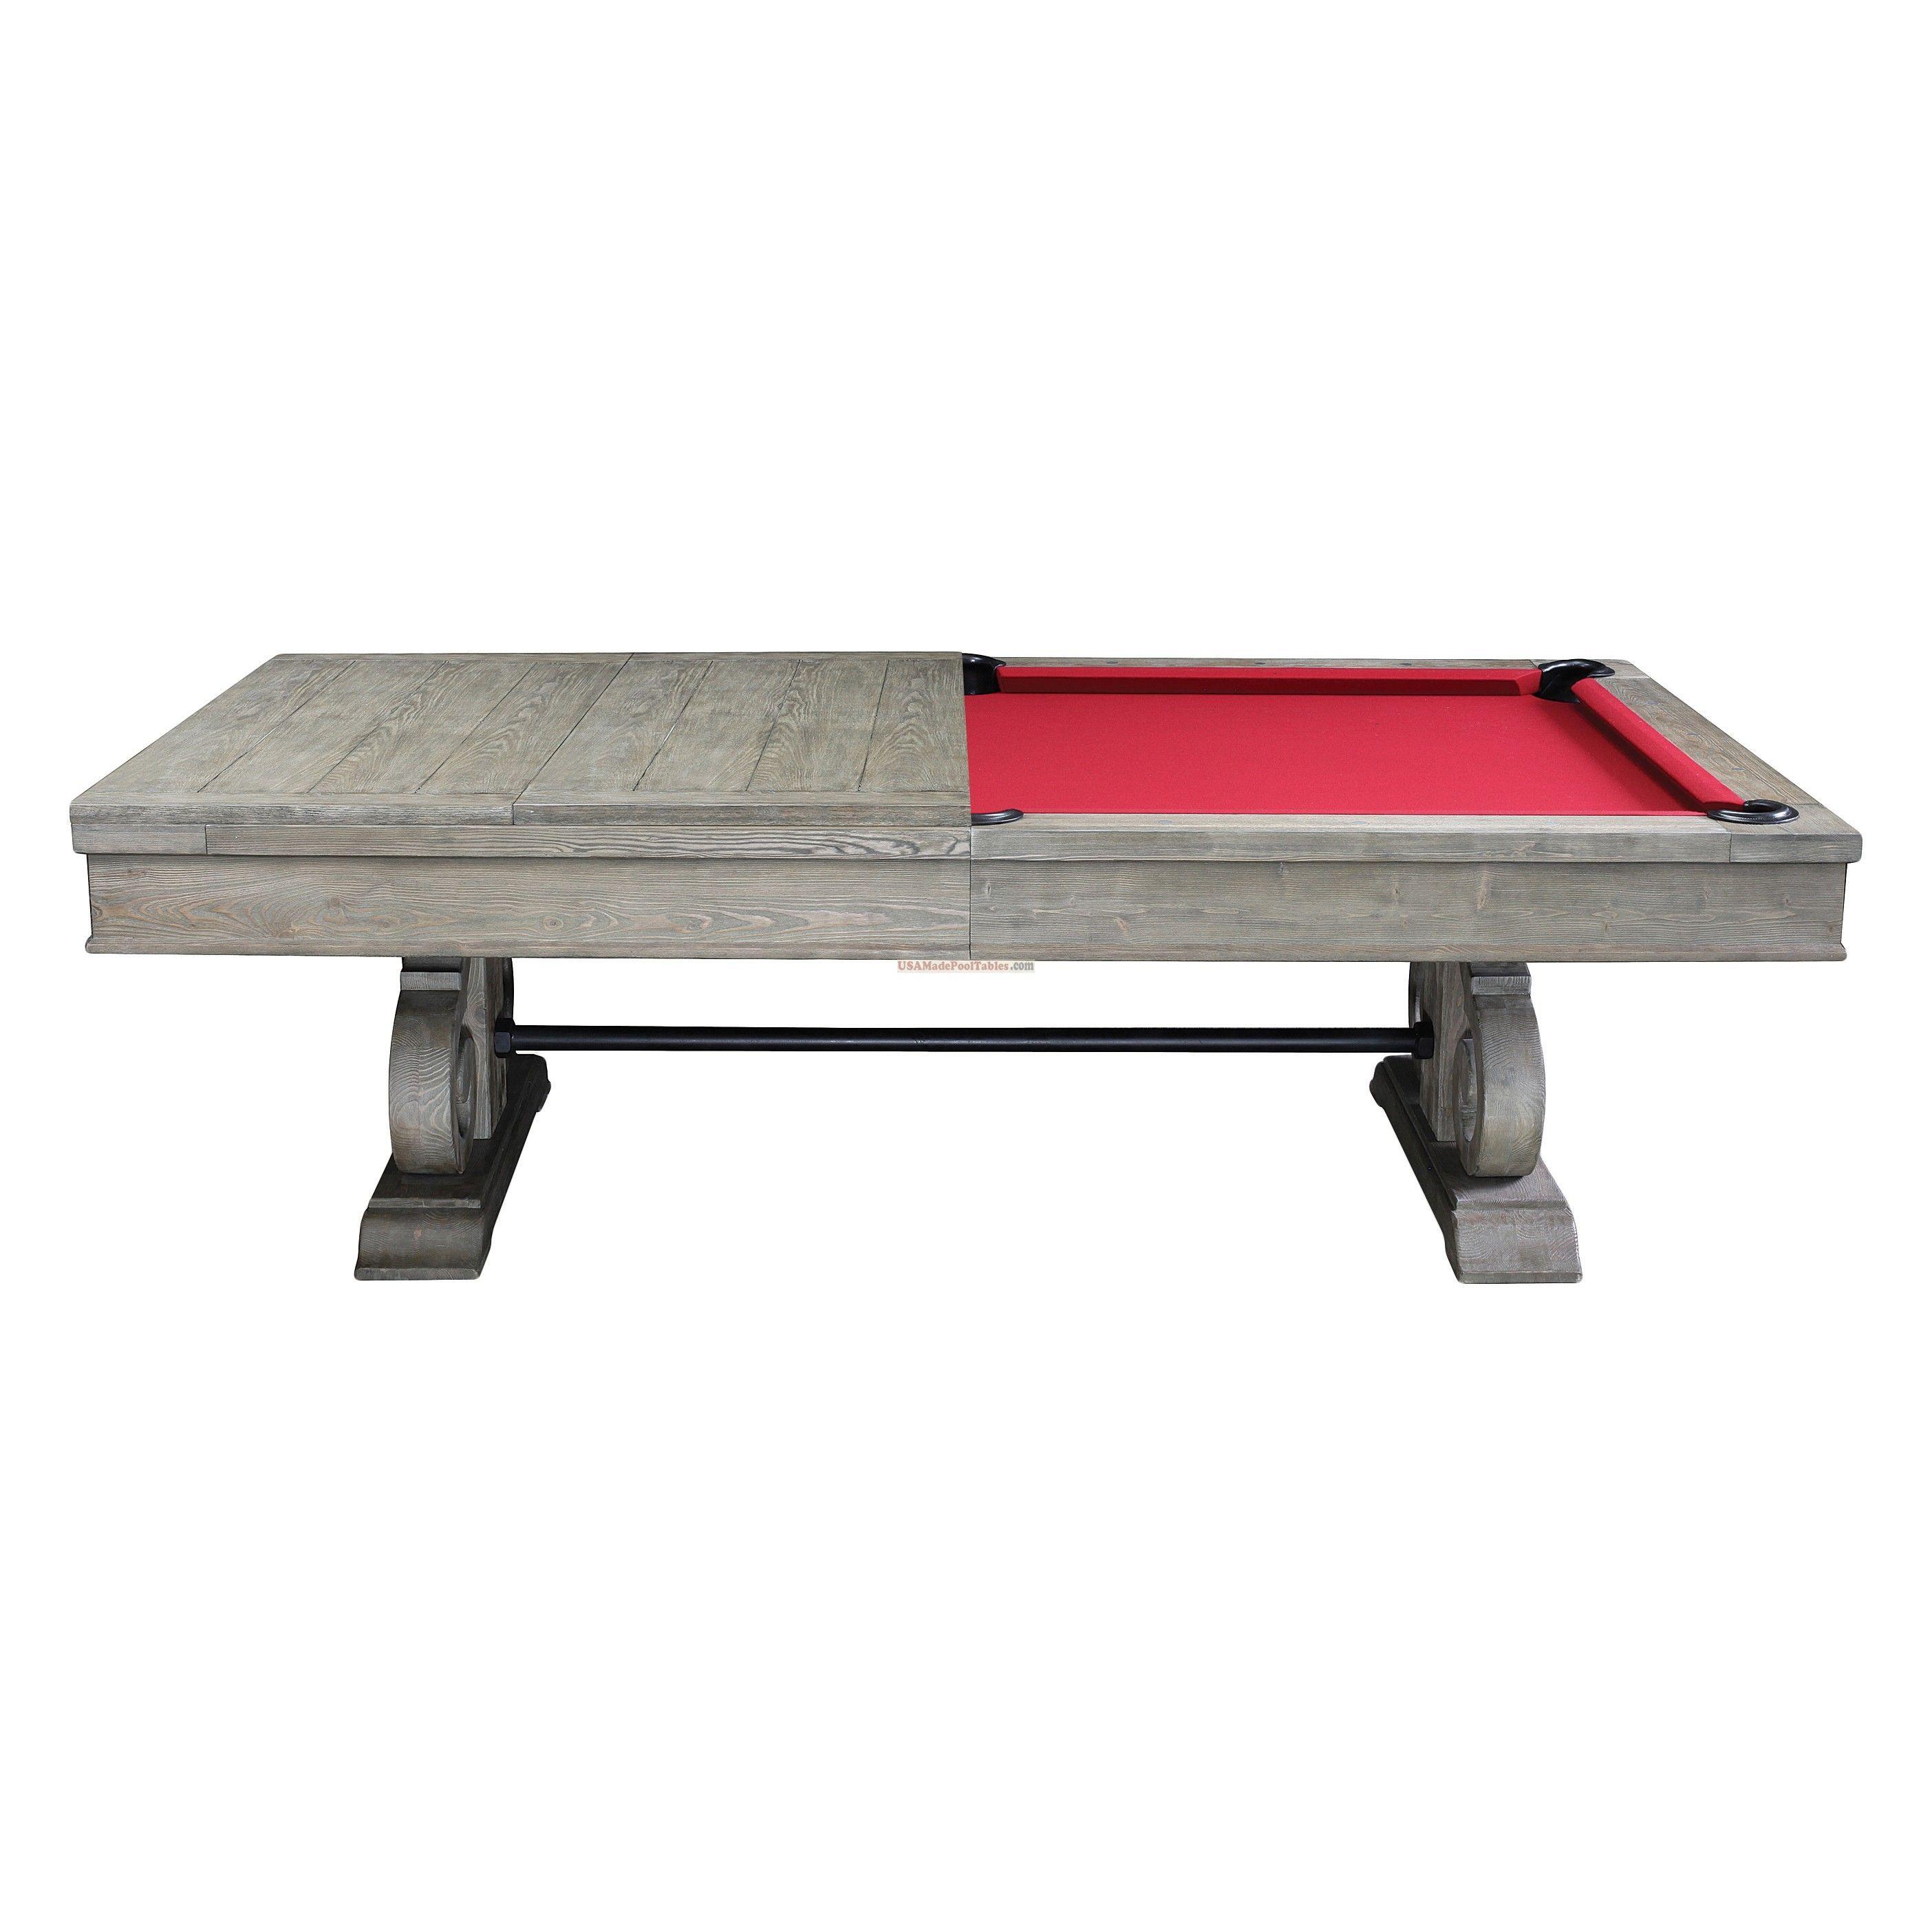 POOL TABLES POOL TABLES POOL TABLE BILLIARDS BILLIARD TABLES - Billiard dining table combination